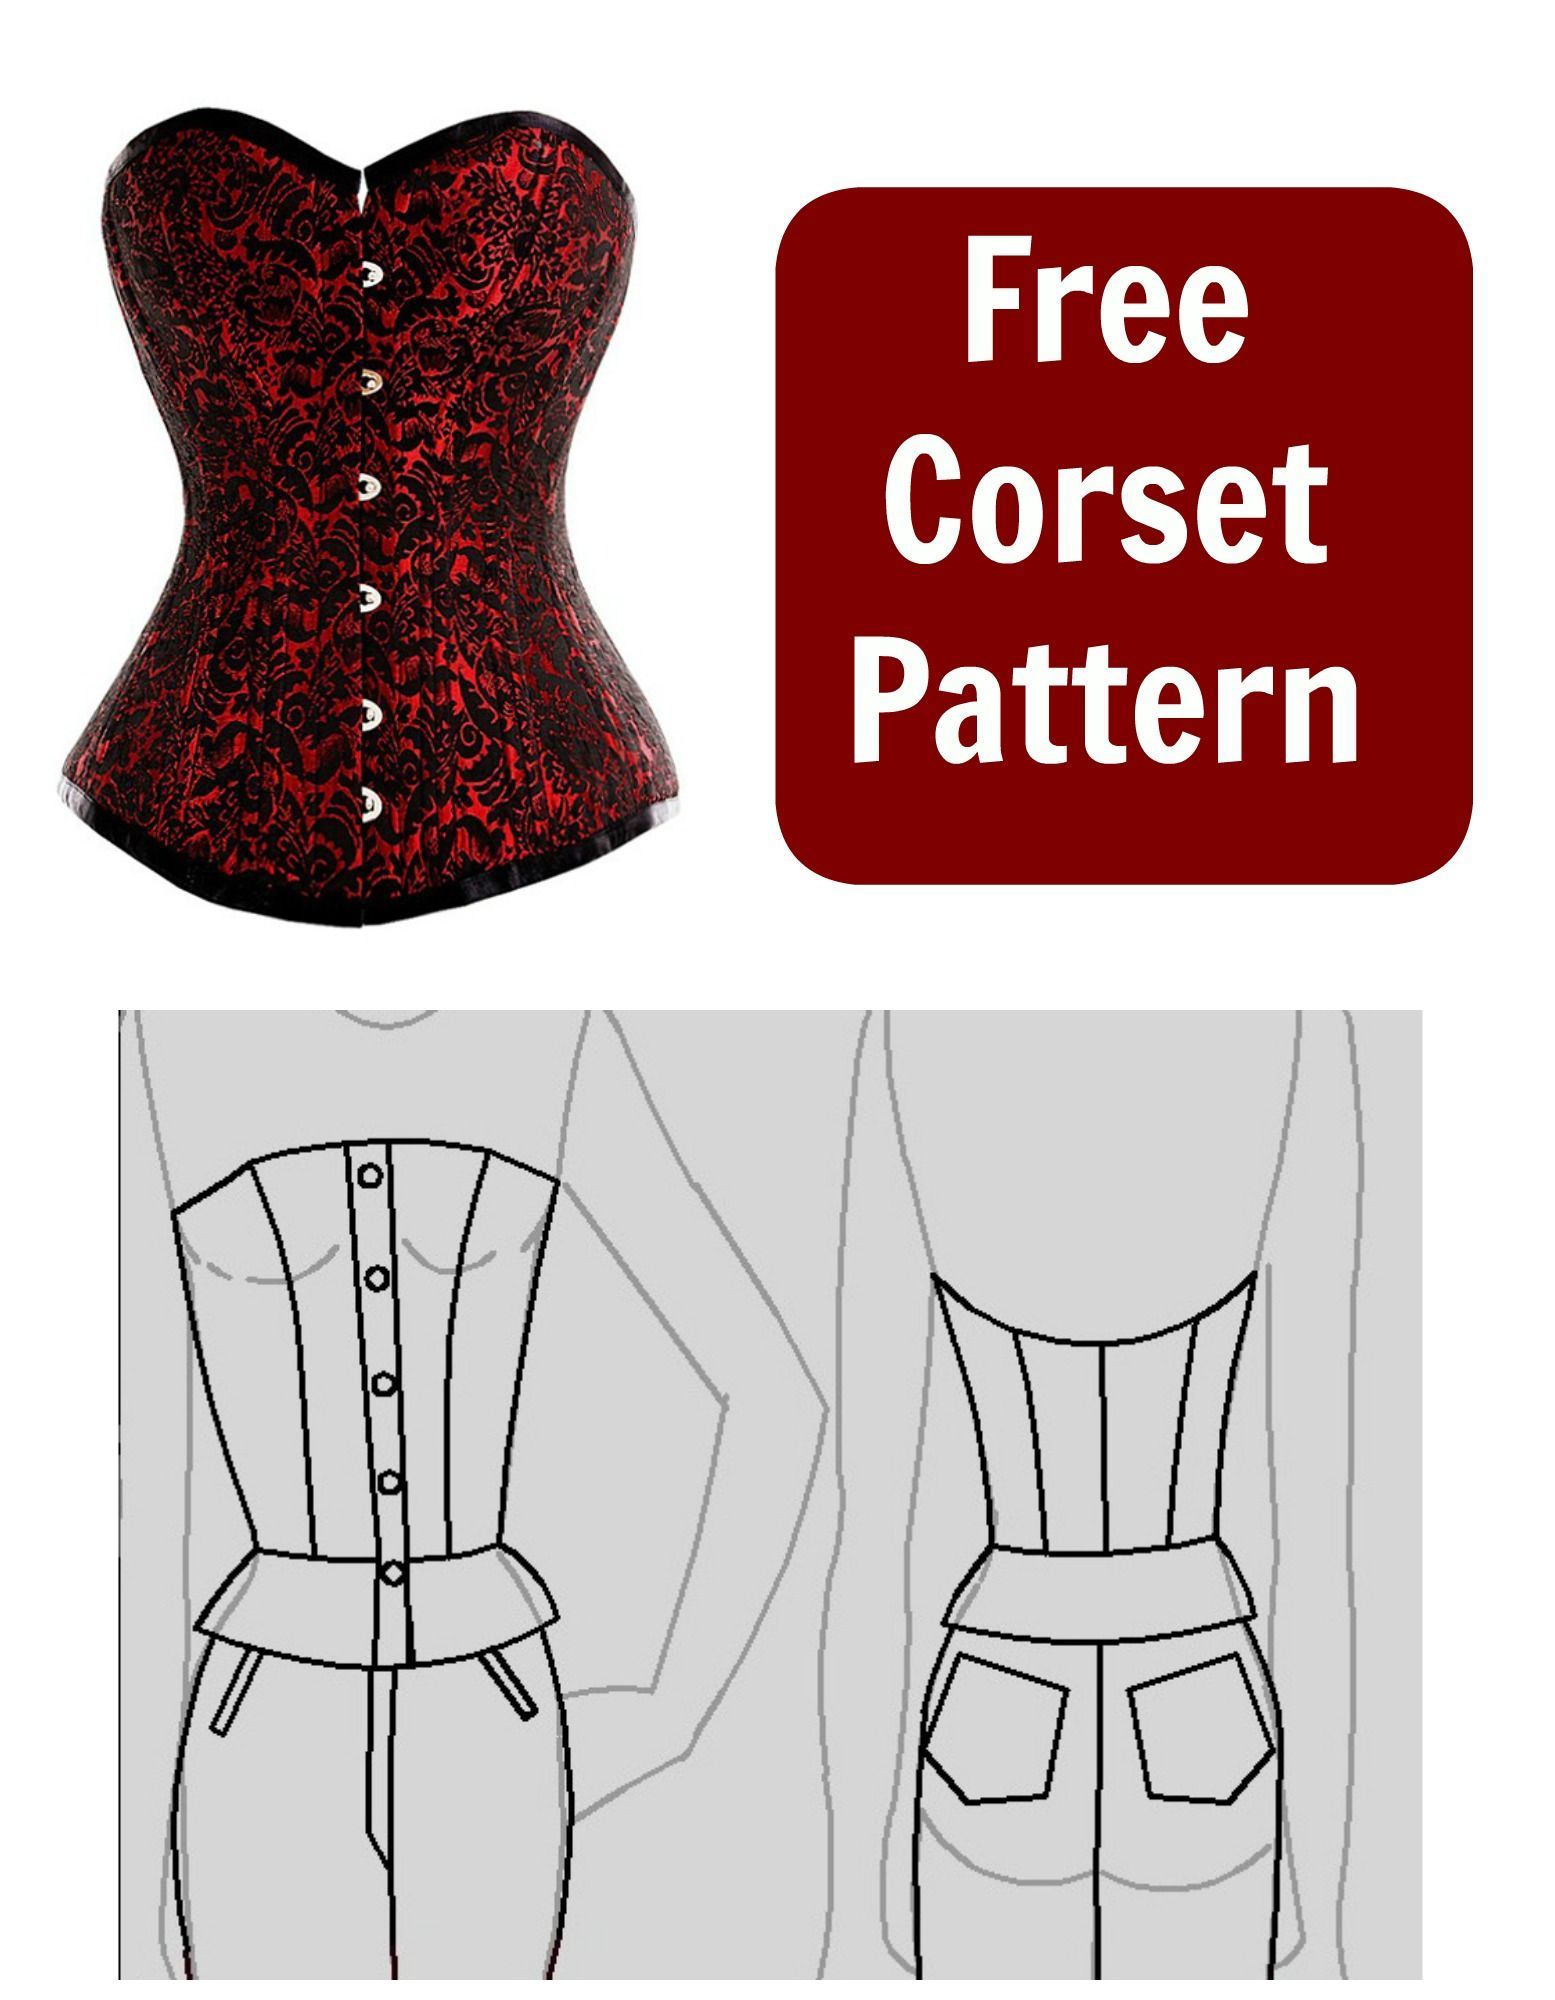 Free Corset Pattern | корсеты,нижнее белье,купальники | Pinterest ...